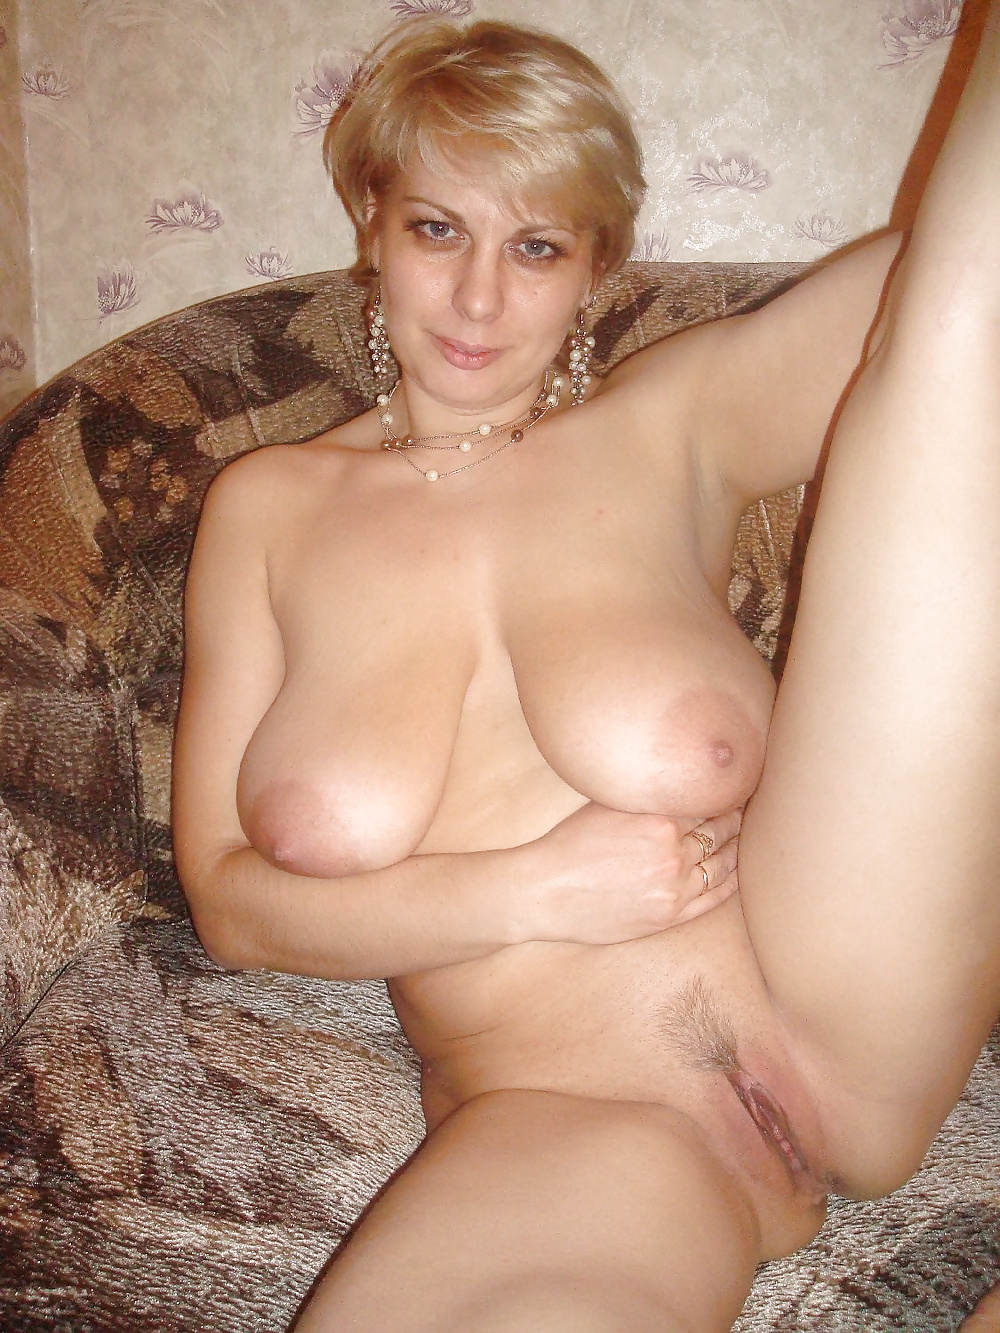 Фото зрелых женщин голые онлайн — 9